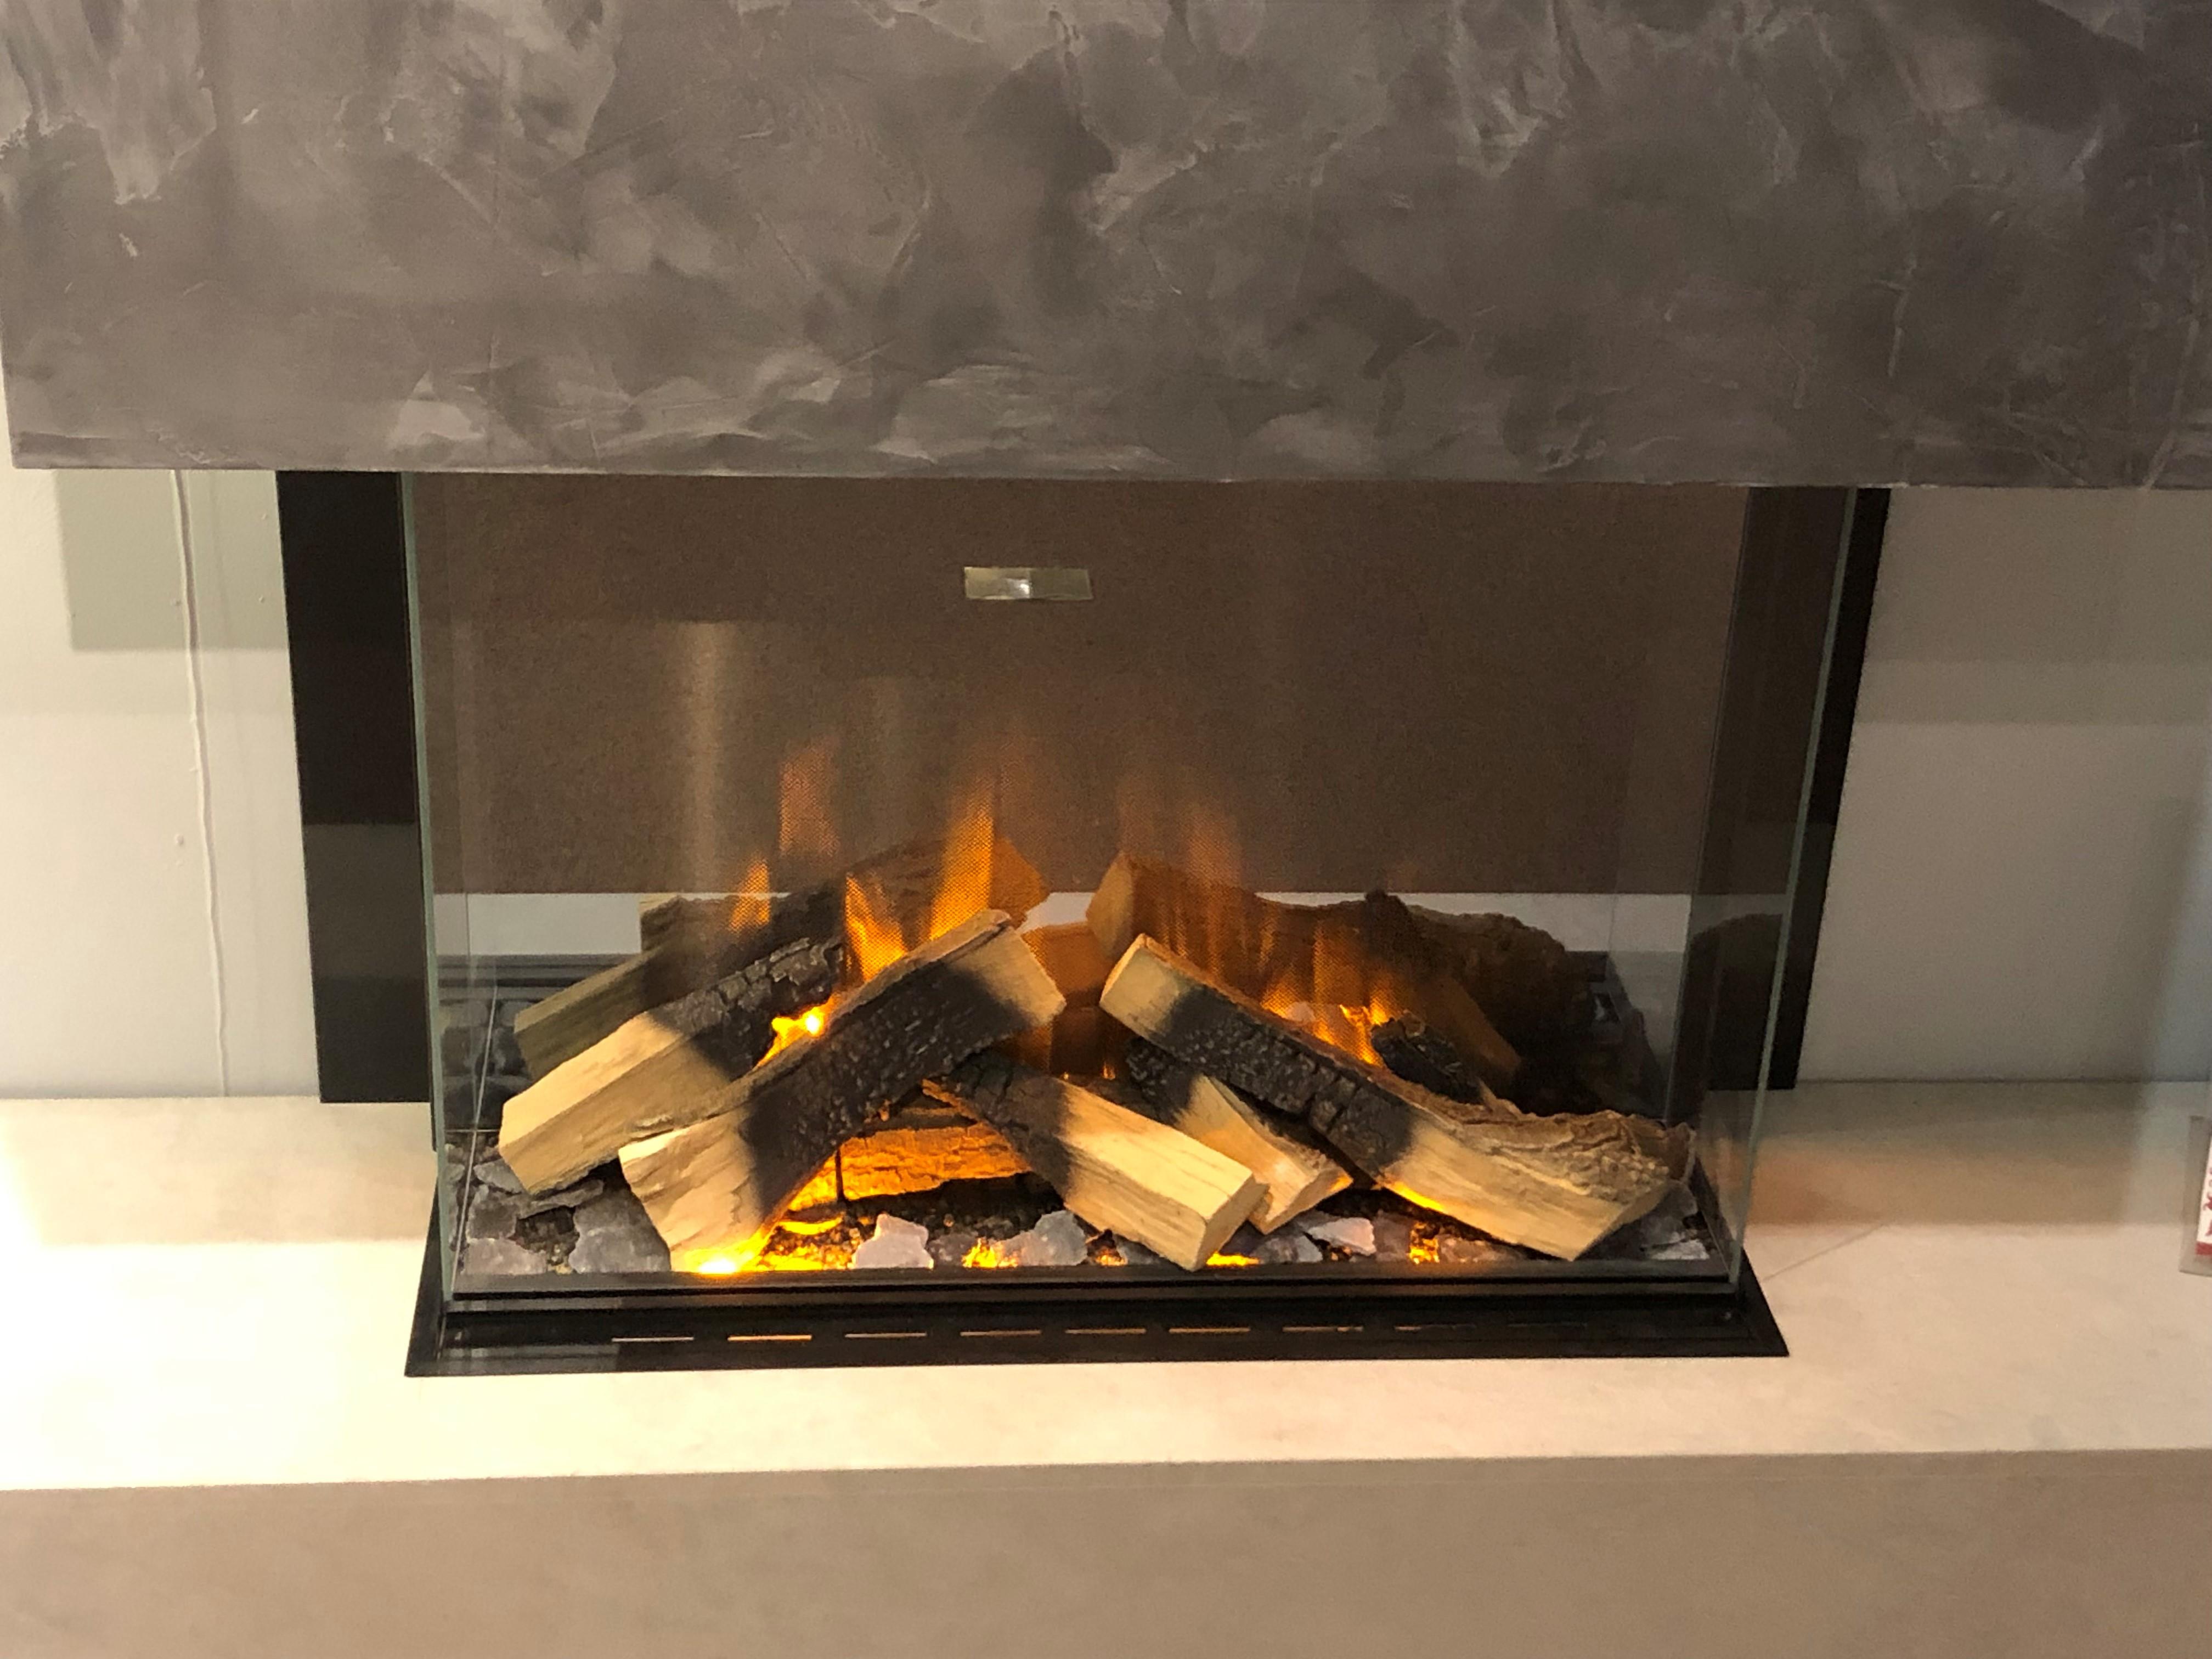 Evonic e800 Electric Fire